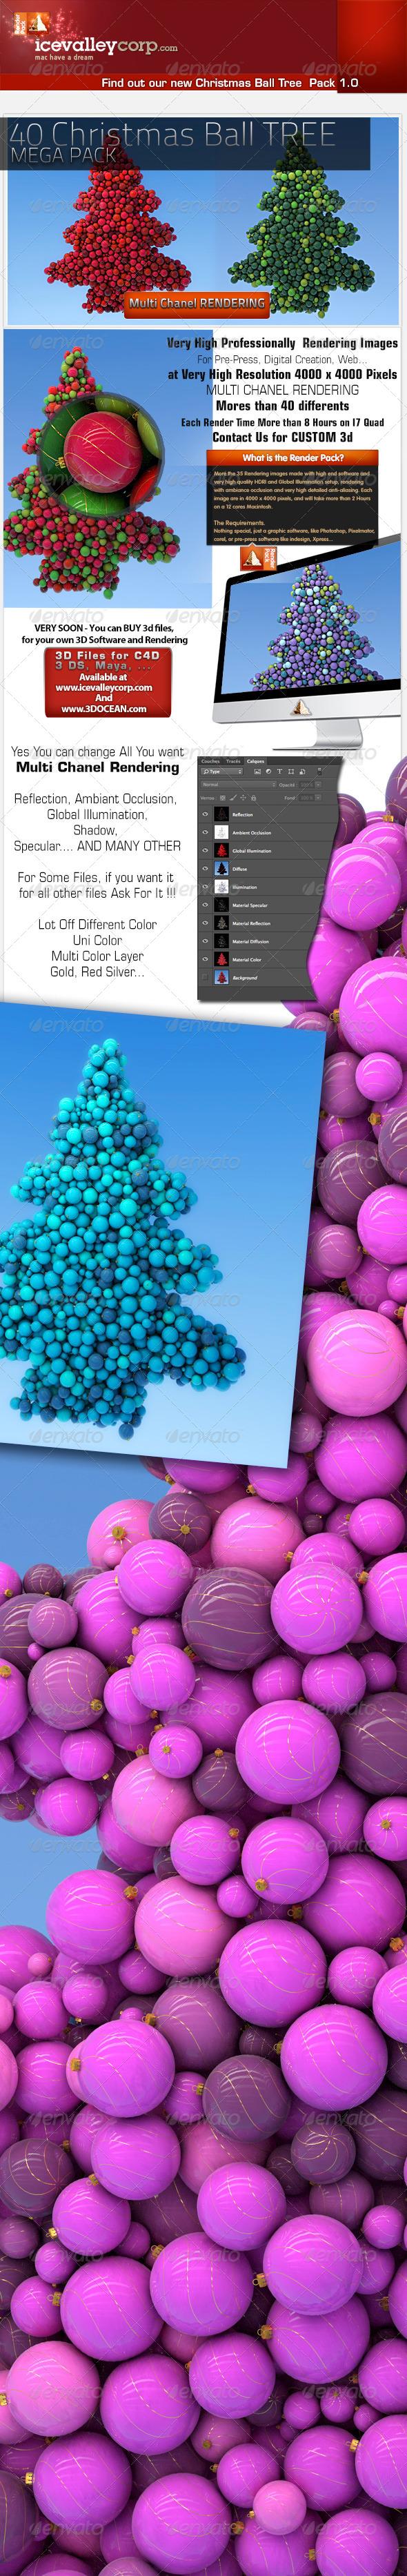 40 Hires Christmas Balls Tree - 4000 Pxl